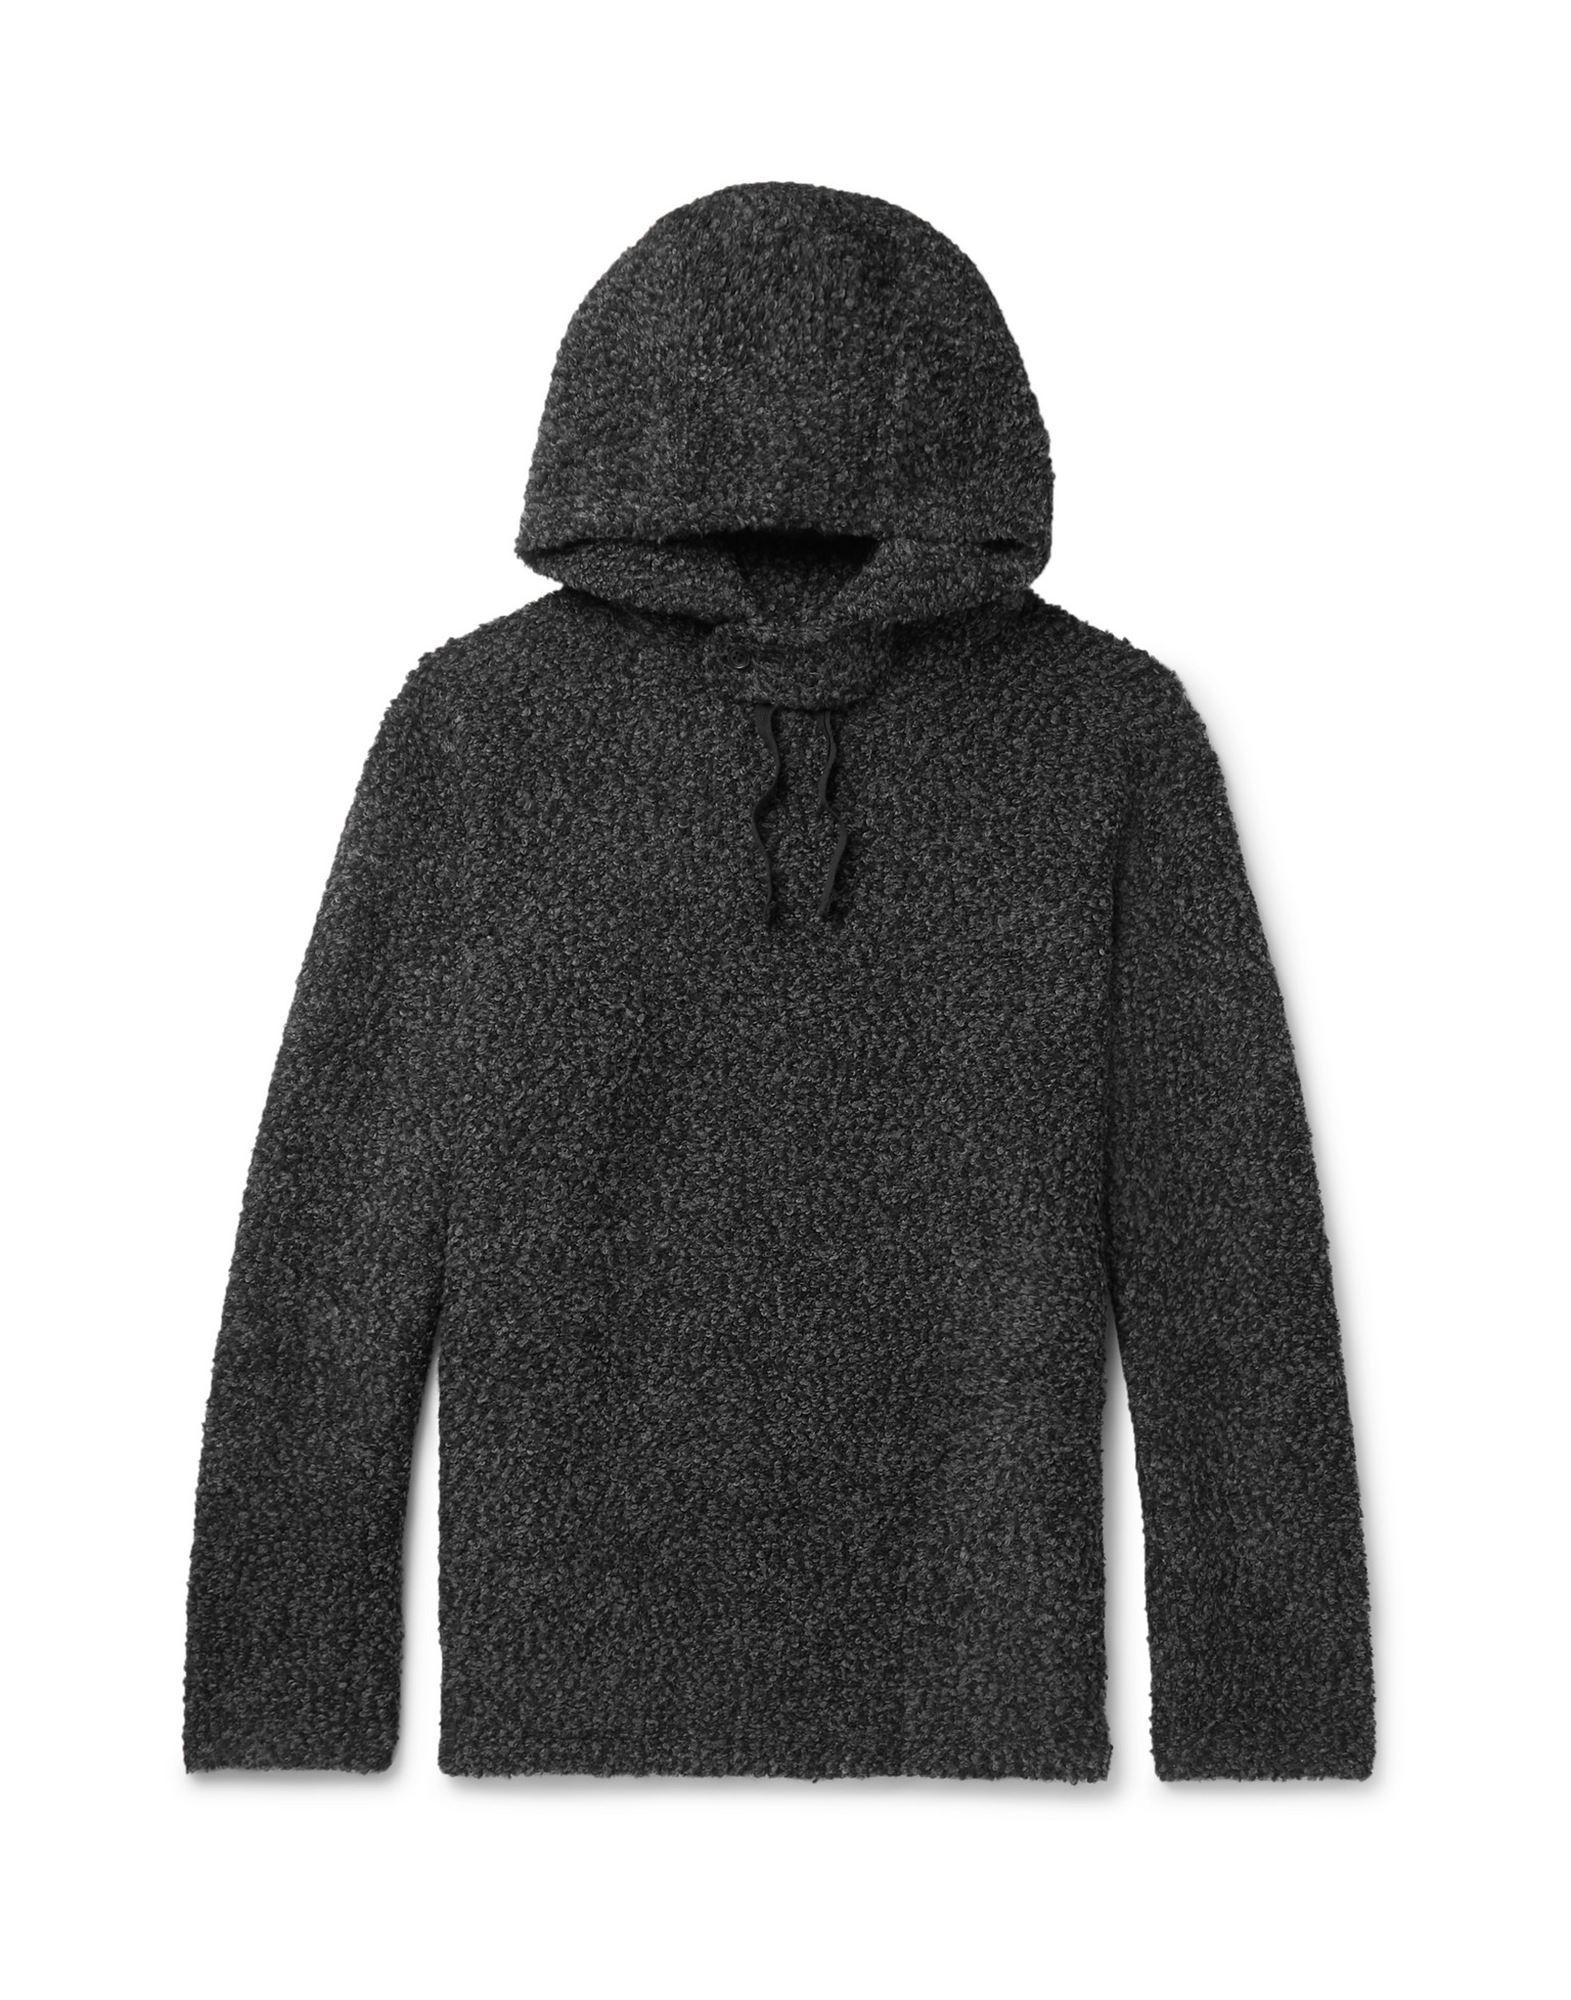 Фото - ENGINEERED GARMENTS Свитер gabriela coll garments пальто